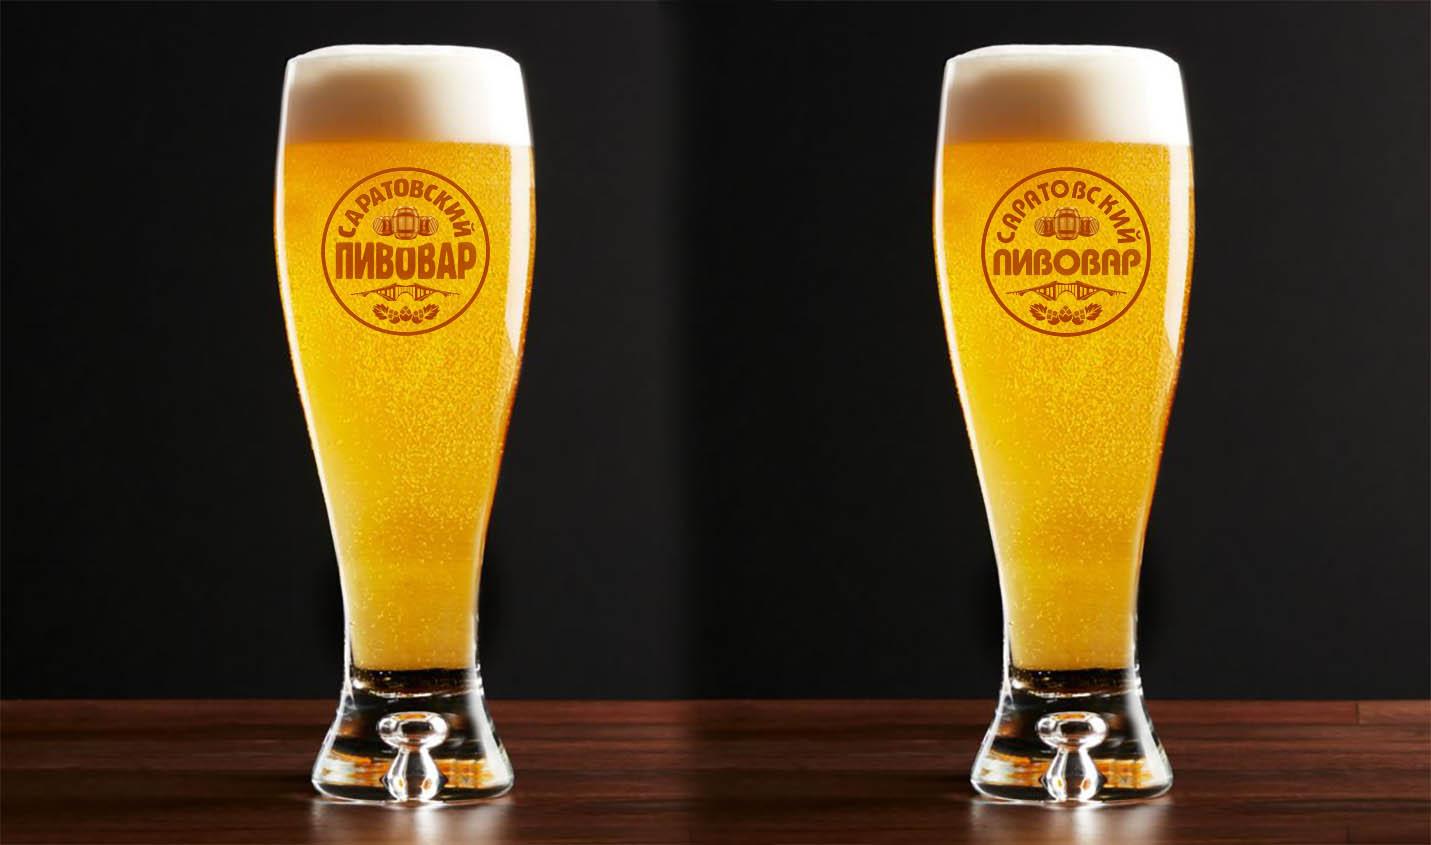 Разработка логотипа для частной пивоварни фото f_3945d7b58453877e.jpg